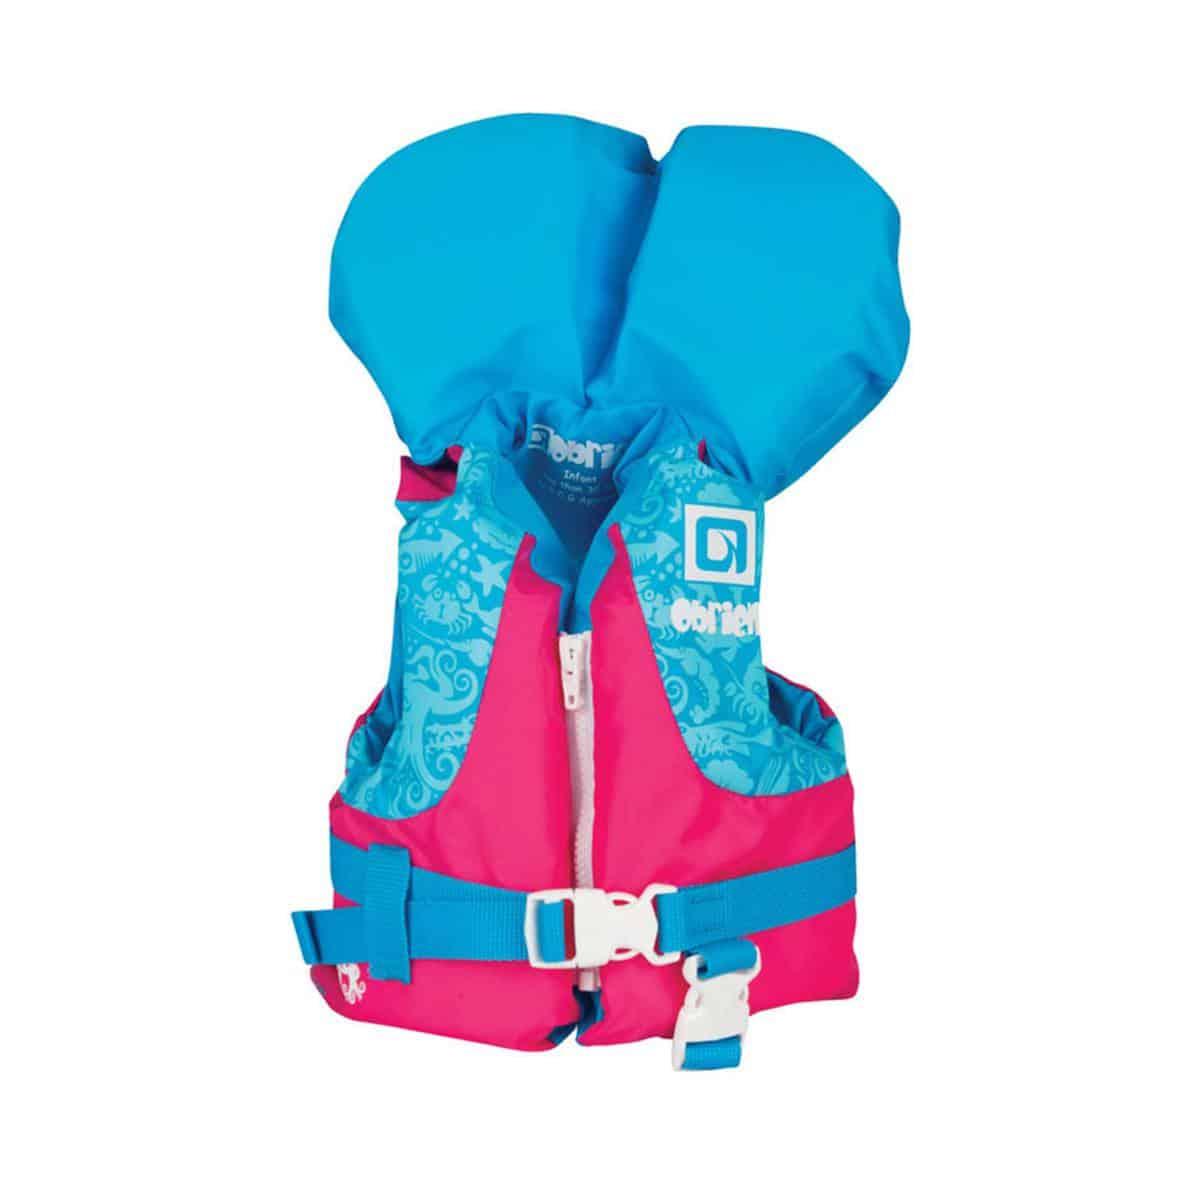 NEW 2018 Obrien Nylon life jacket - Shipwreck Marine